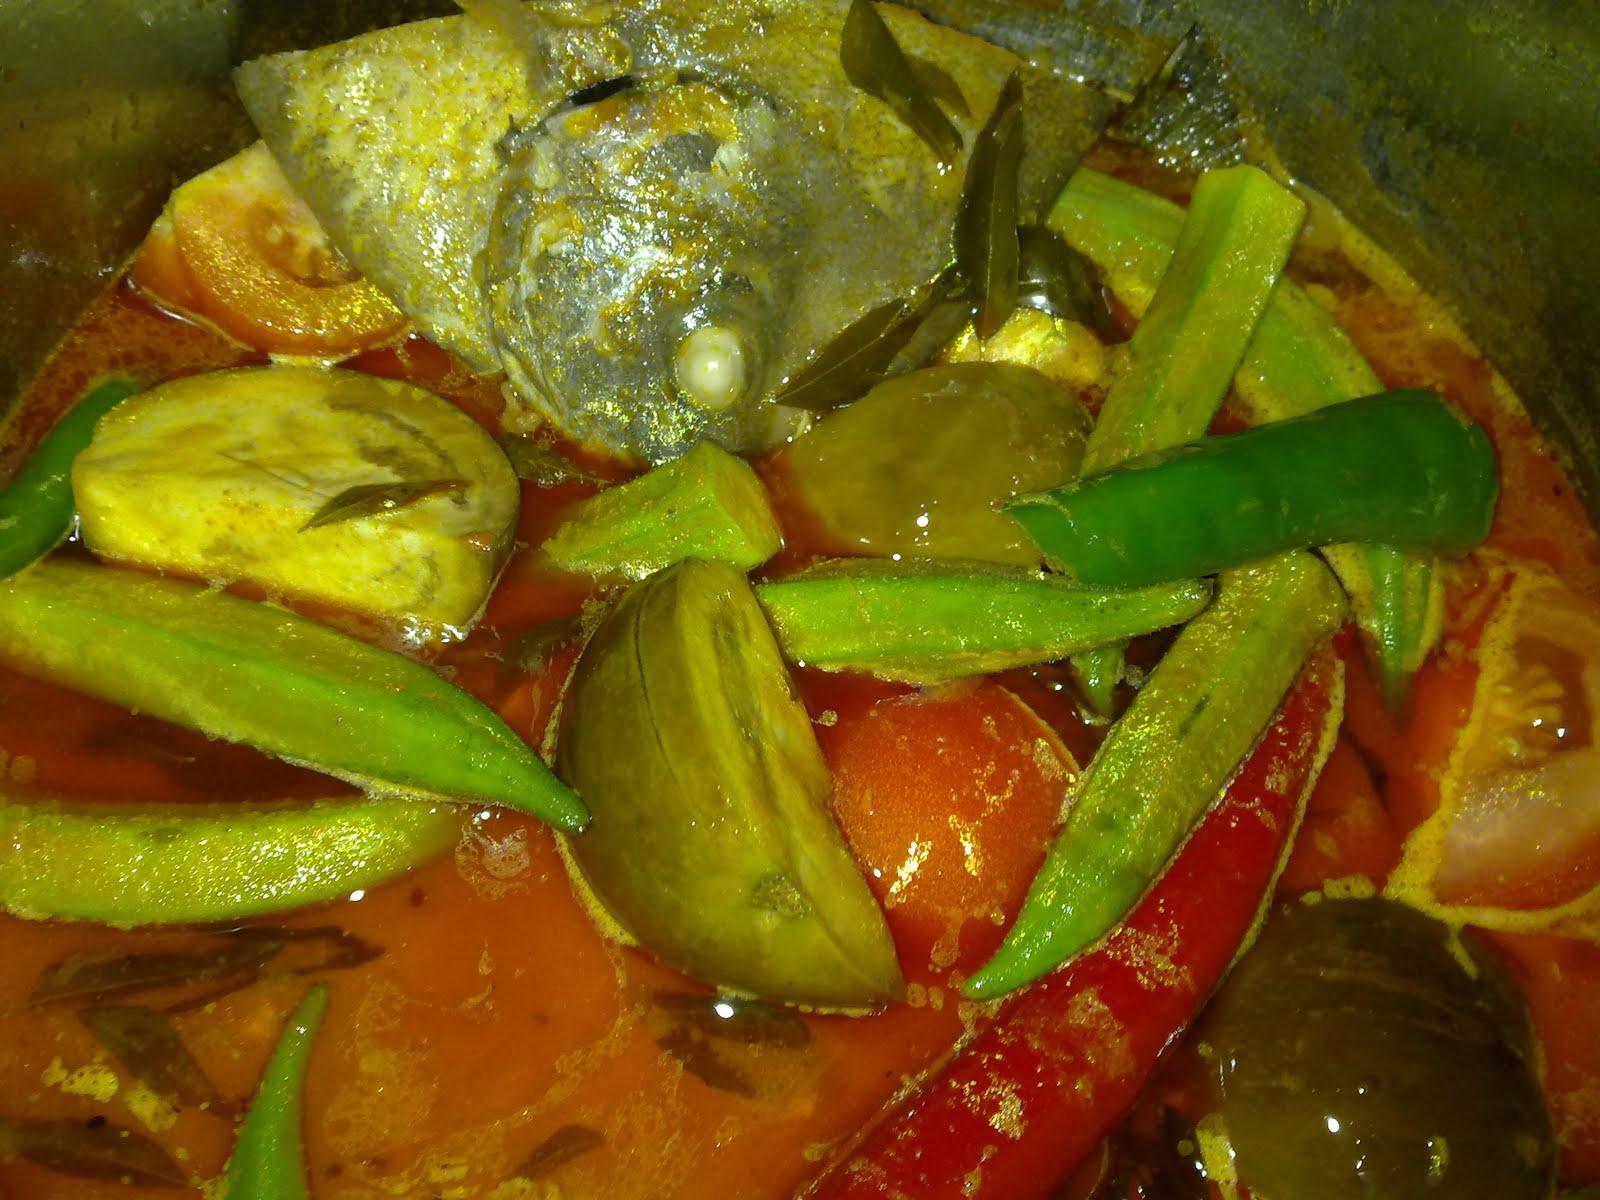 Resepi Kari Kepala Ikan Ala Dezaman DEZAMAN COTTAGE